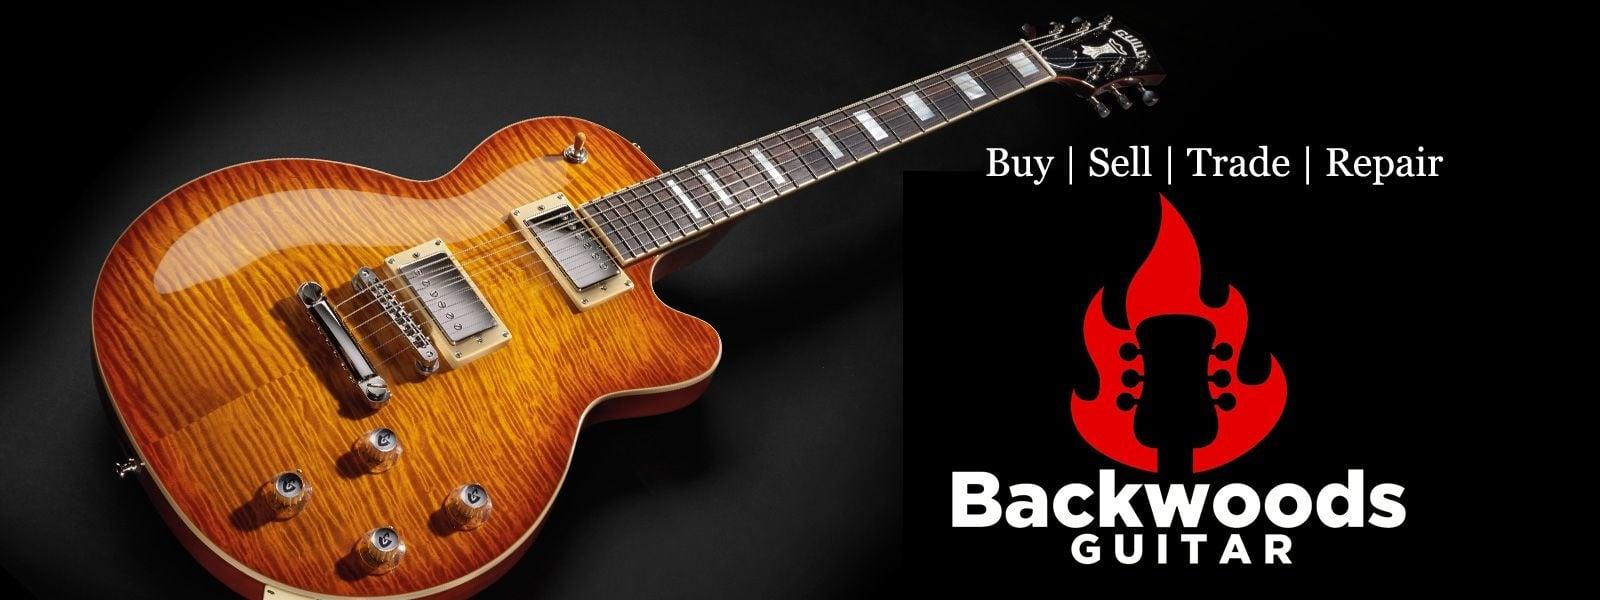 Backwoods Guitar LLC